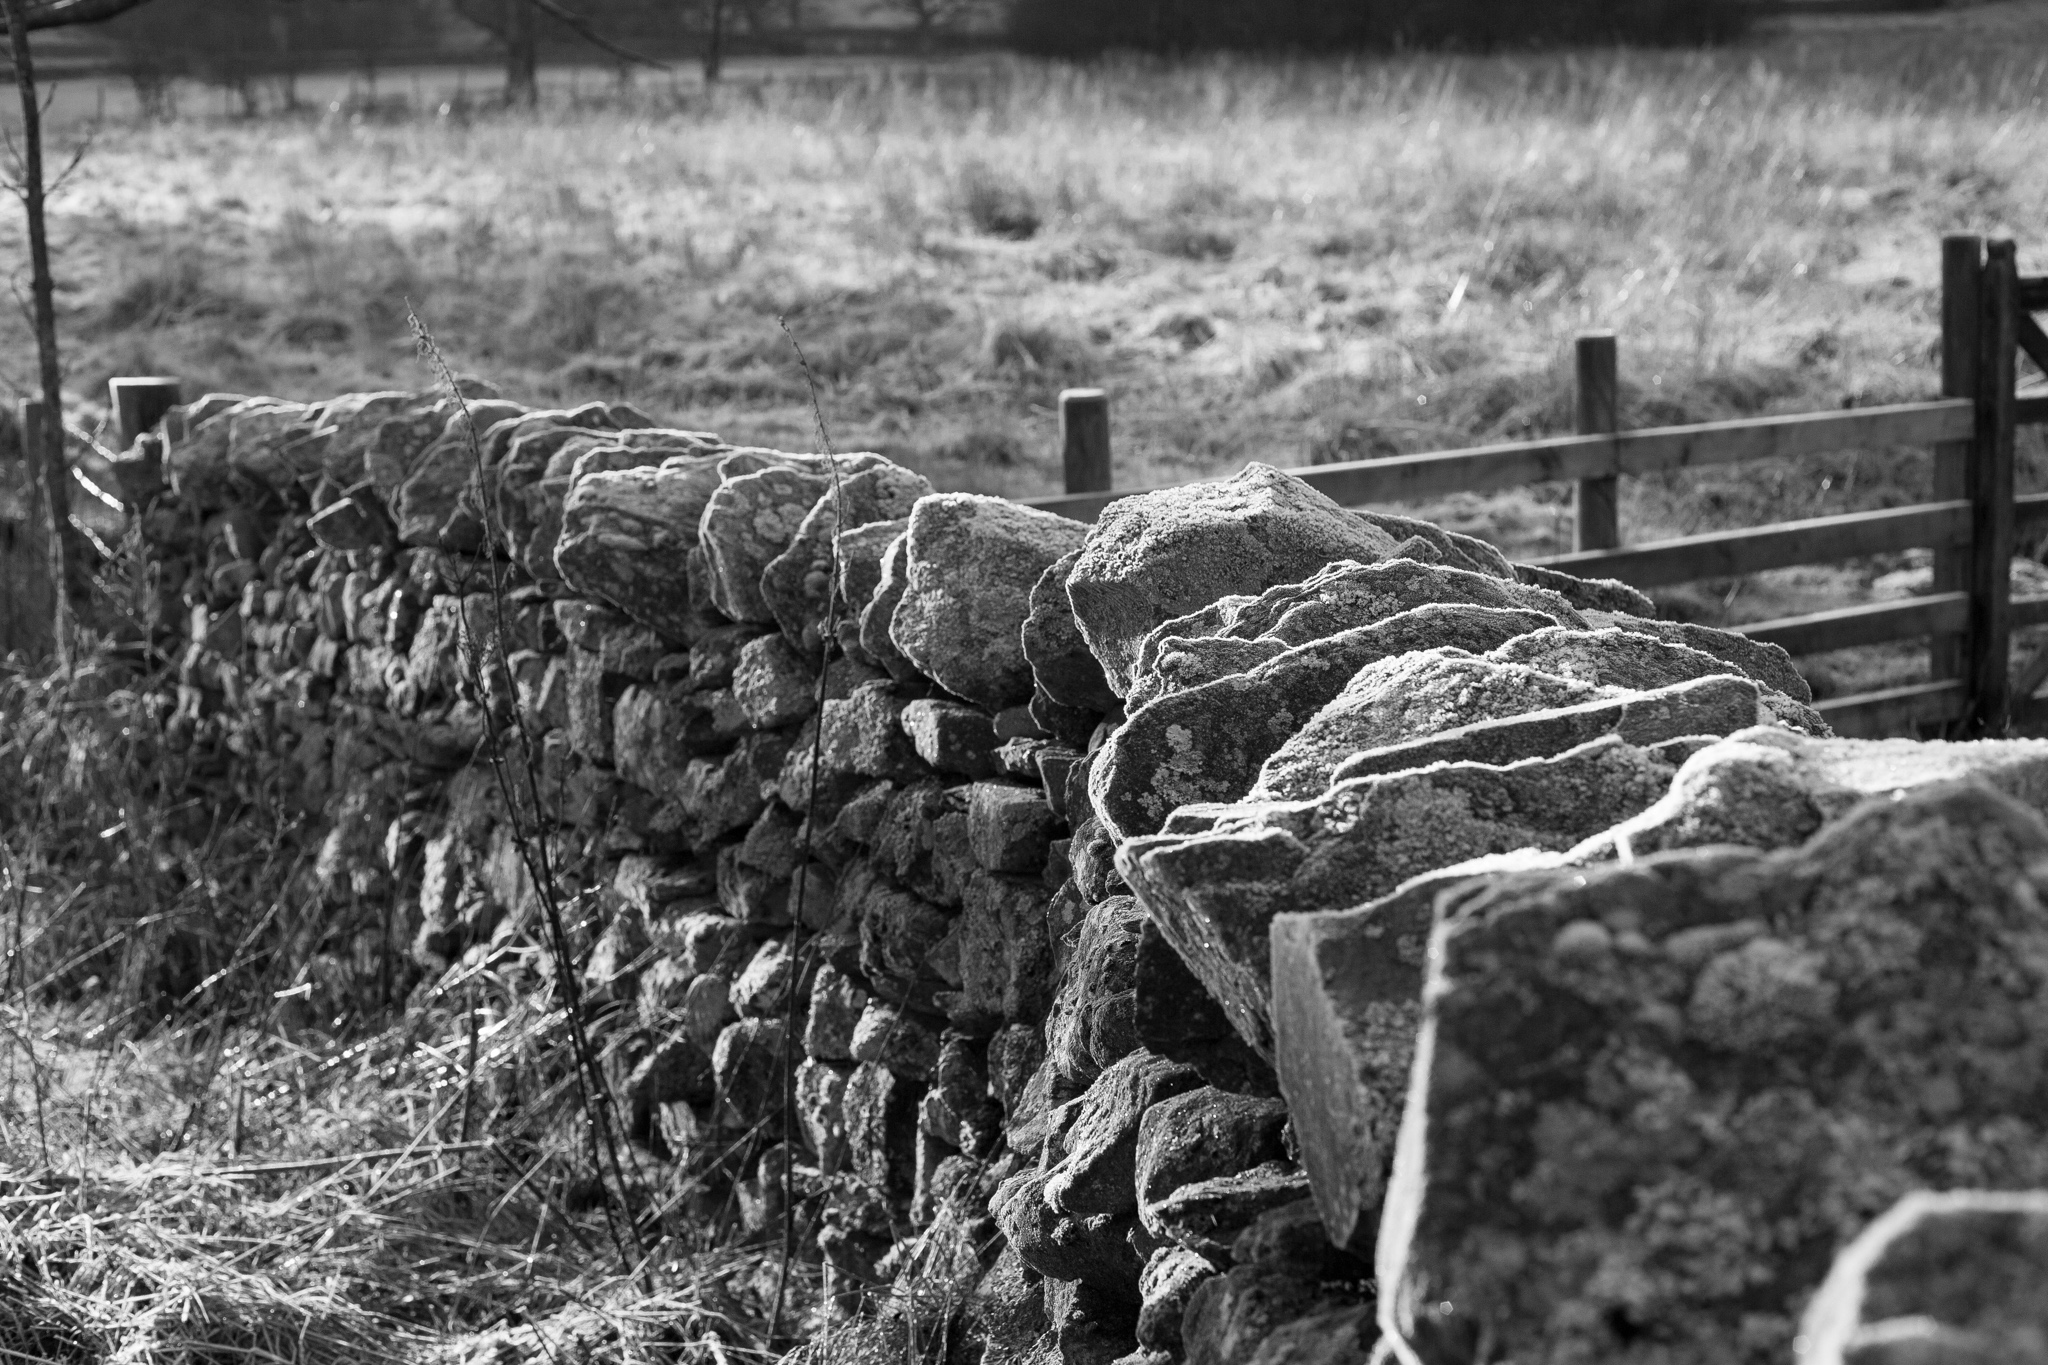 2684-uk-award-winning-landscape-photography.jpg